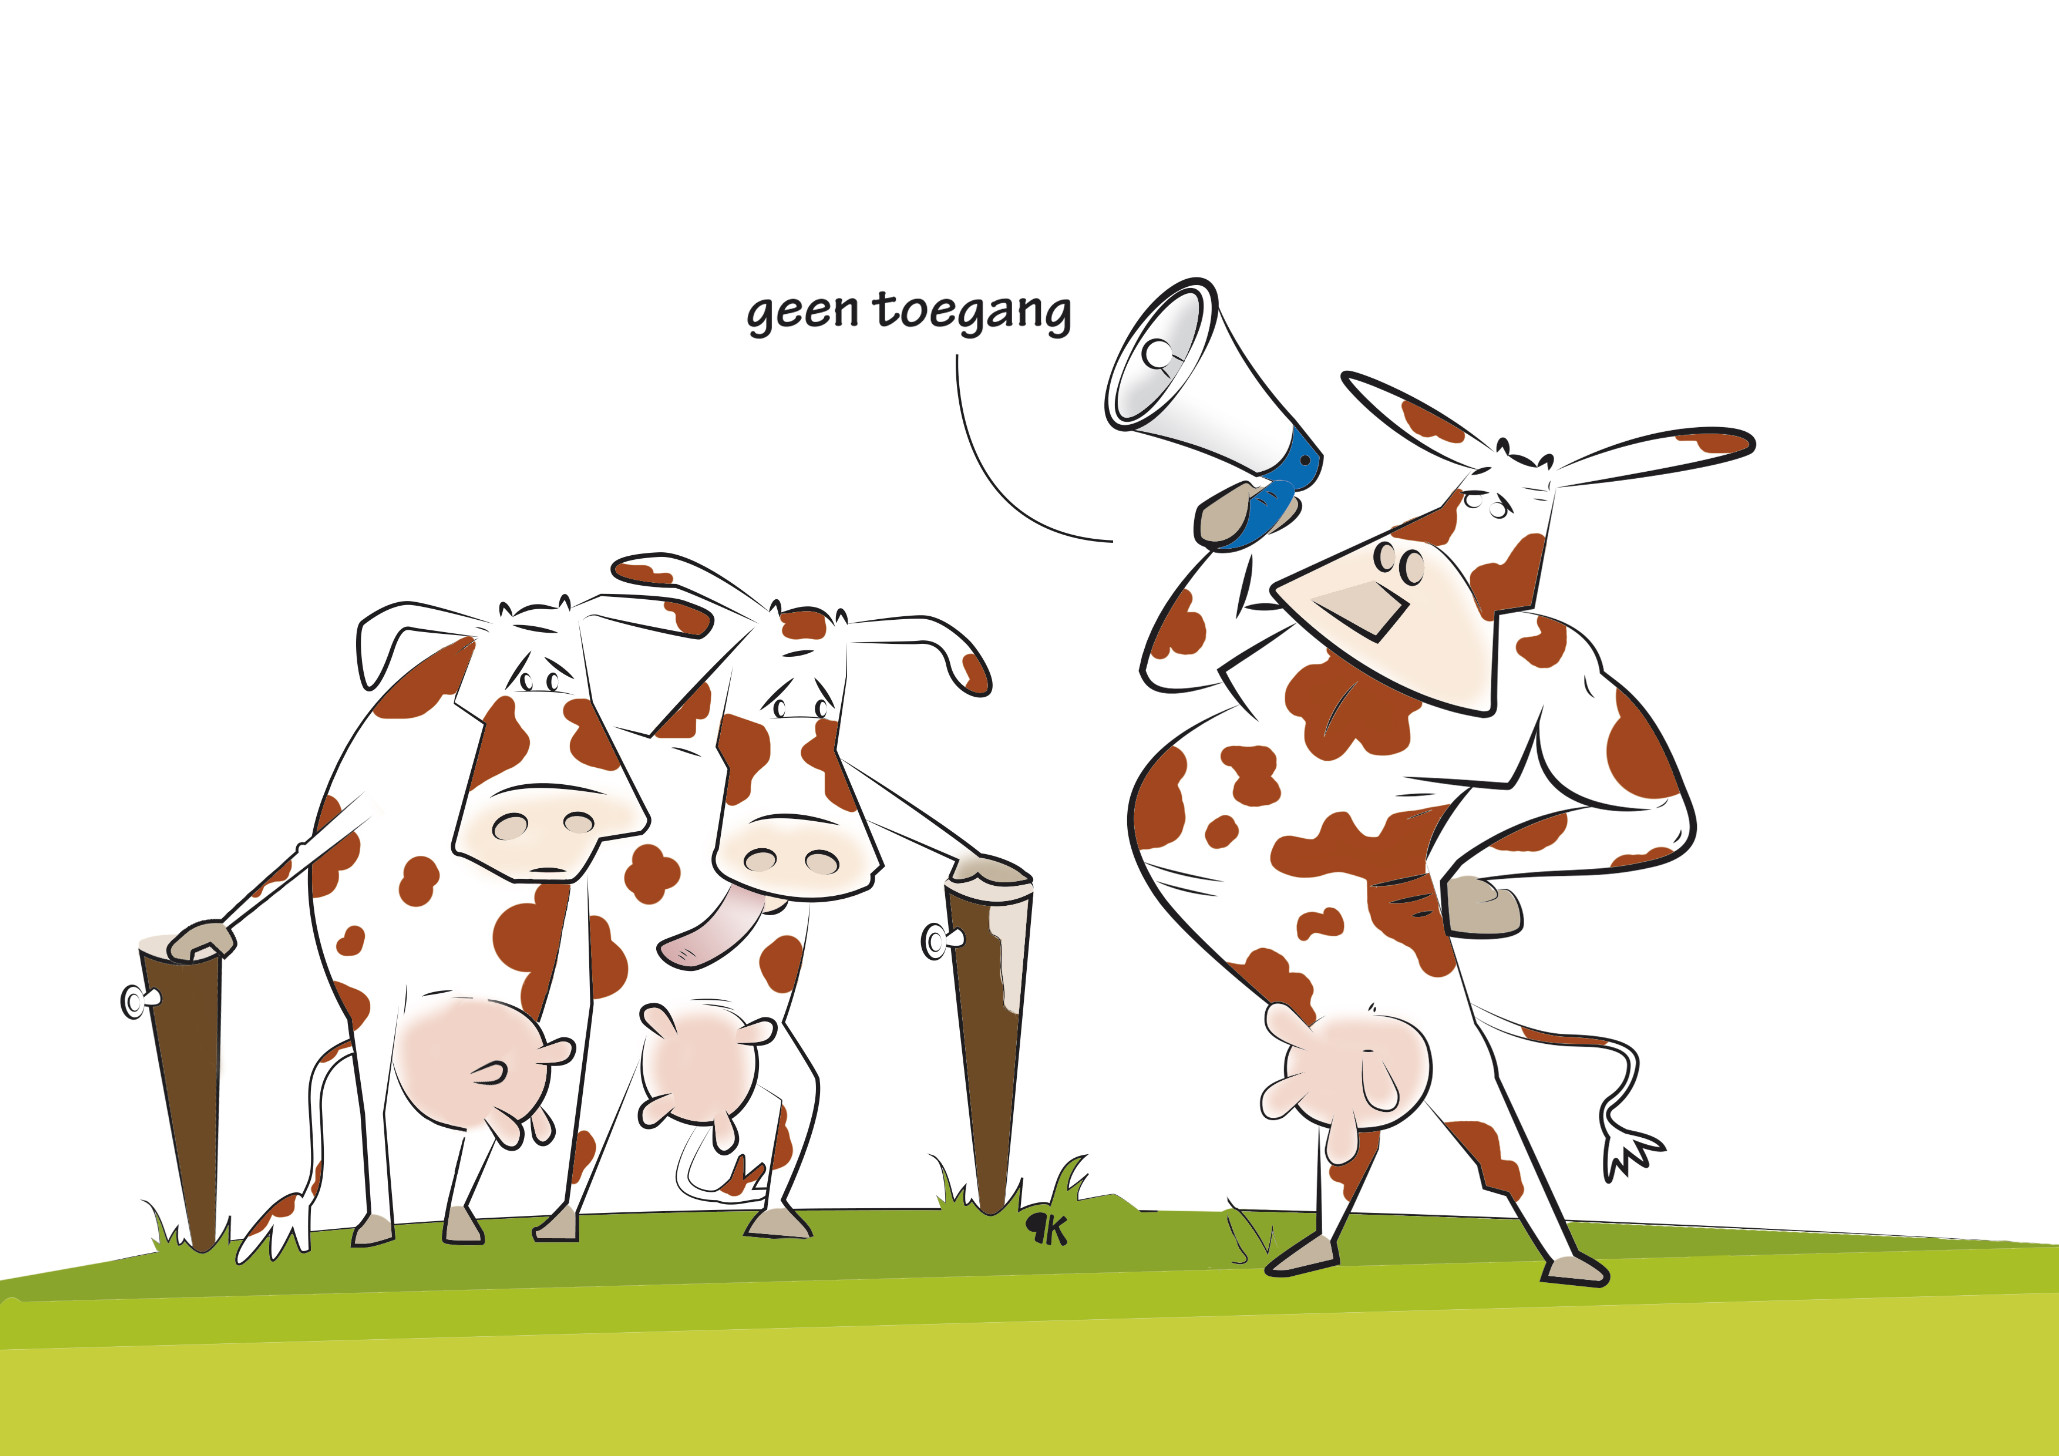 Grote meerderheid melkveehouders rouwt niet om uitspraak gerechtshof